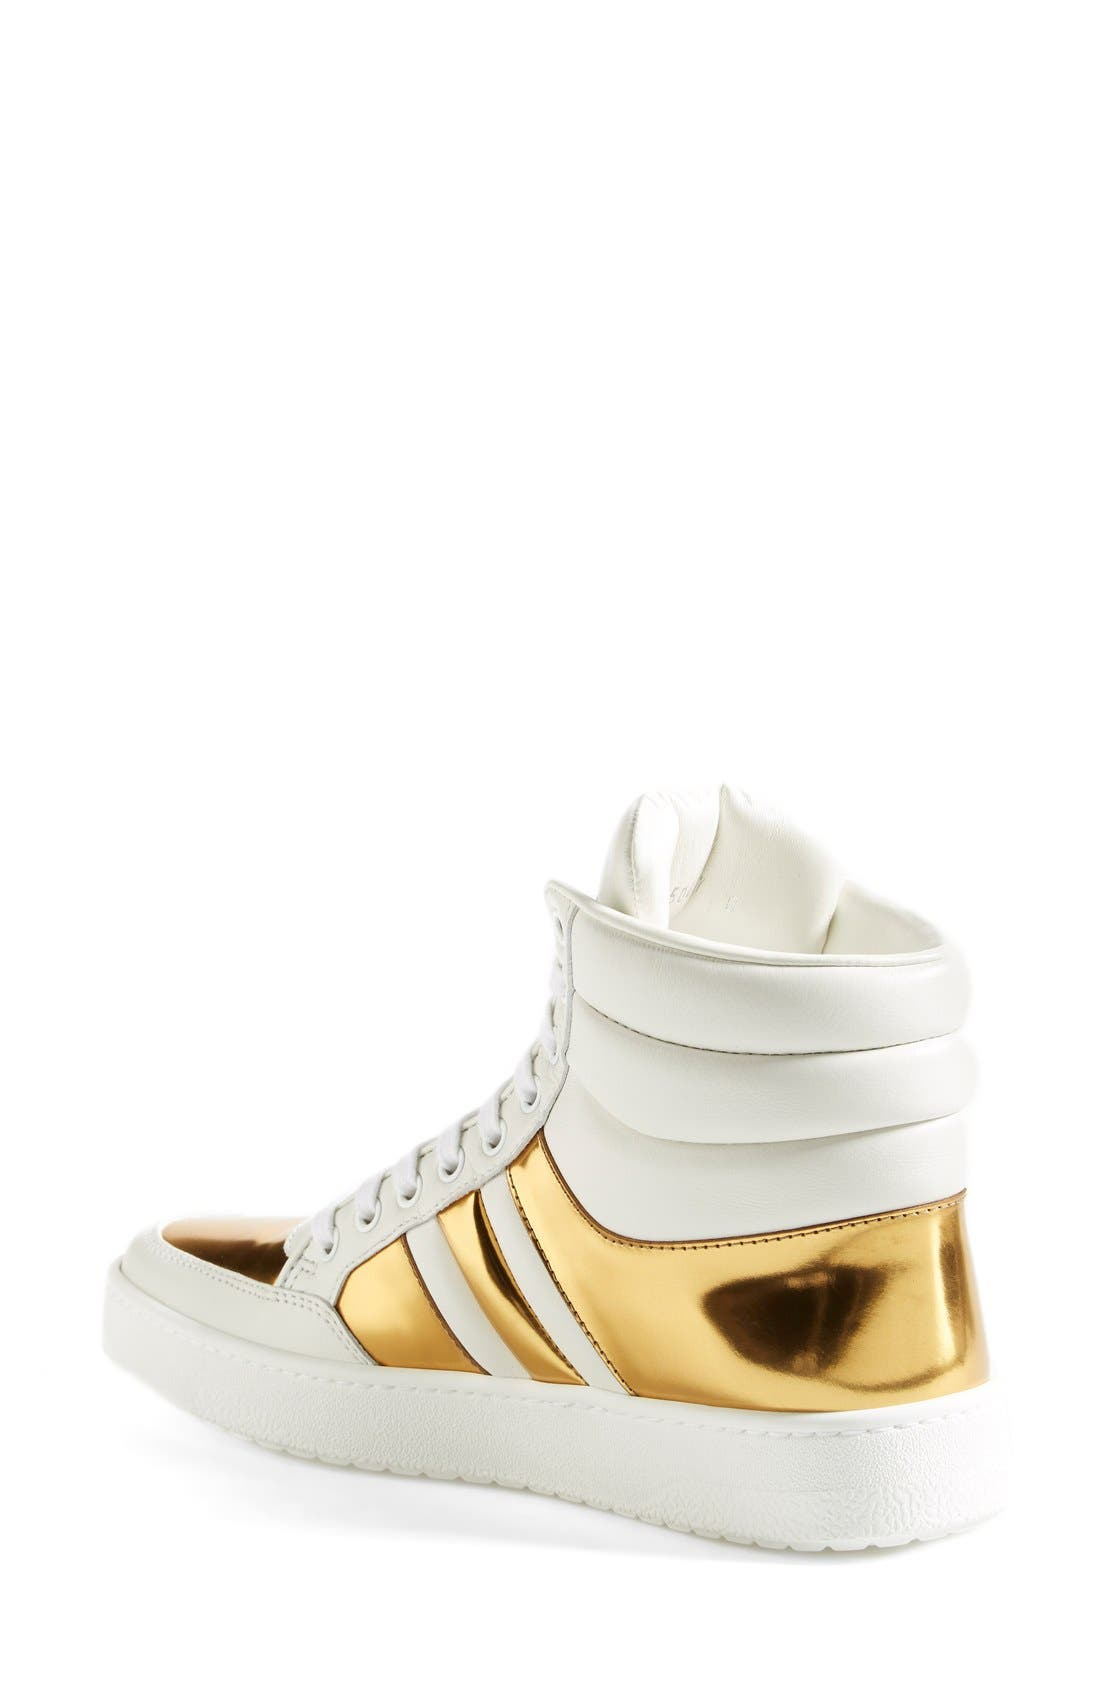 Alternate Image 2  - Gucci 'Ronnie' High Top Sneaker (Women)